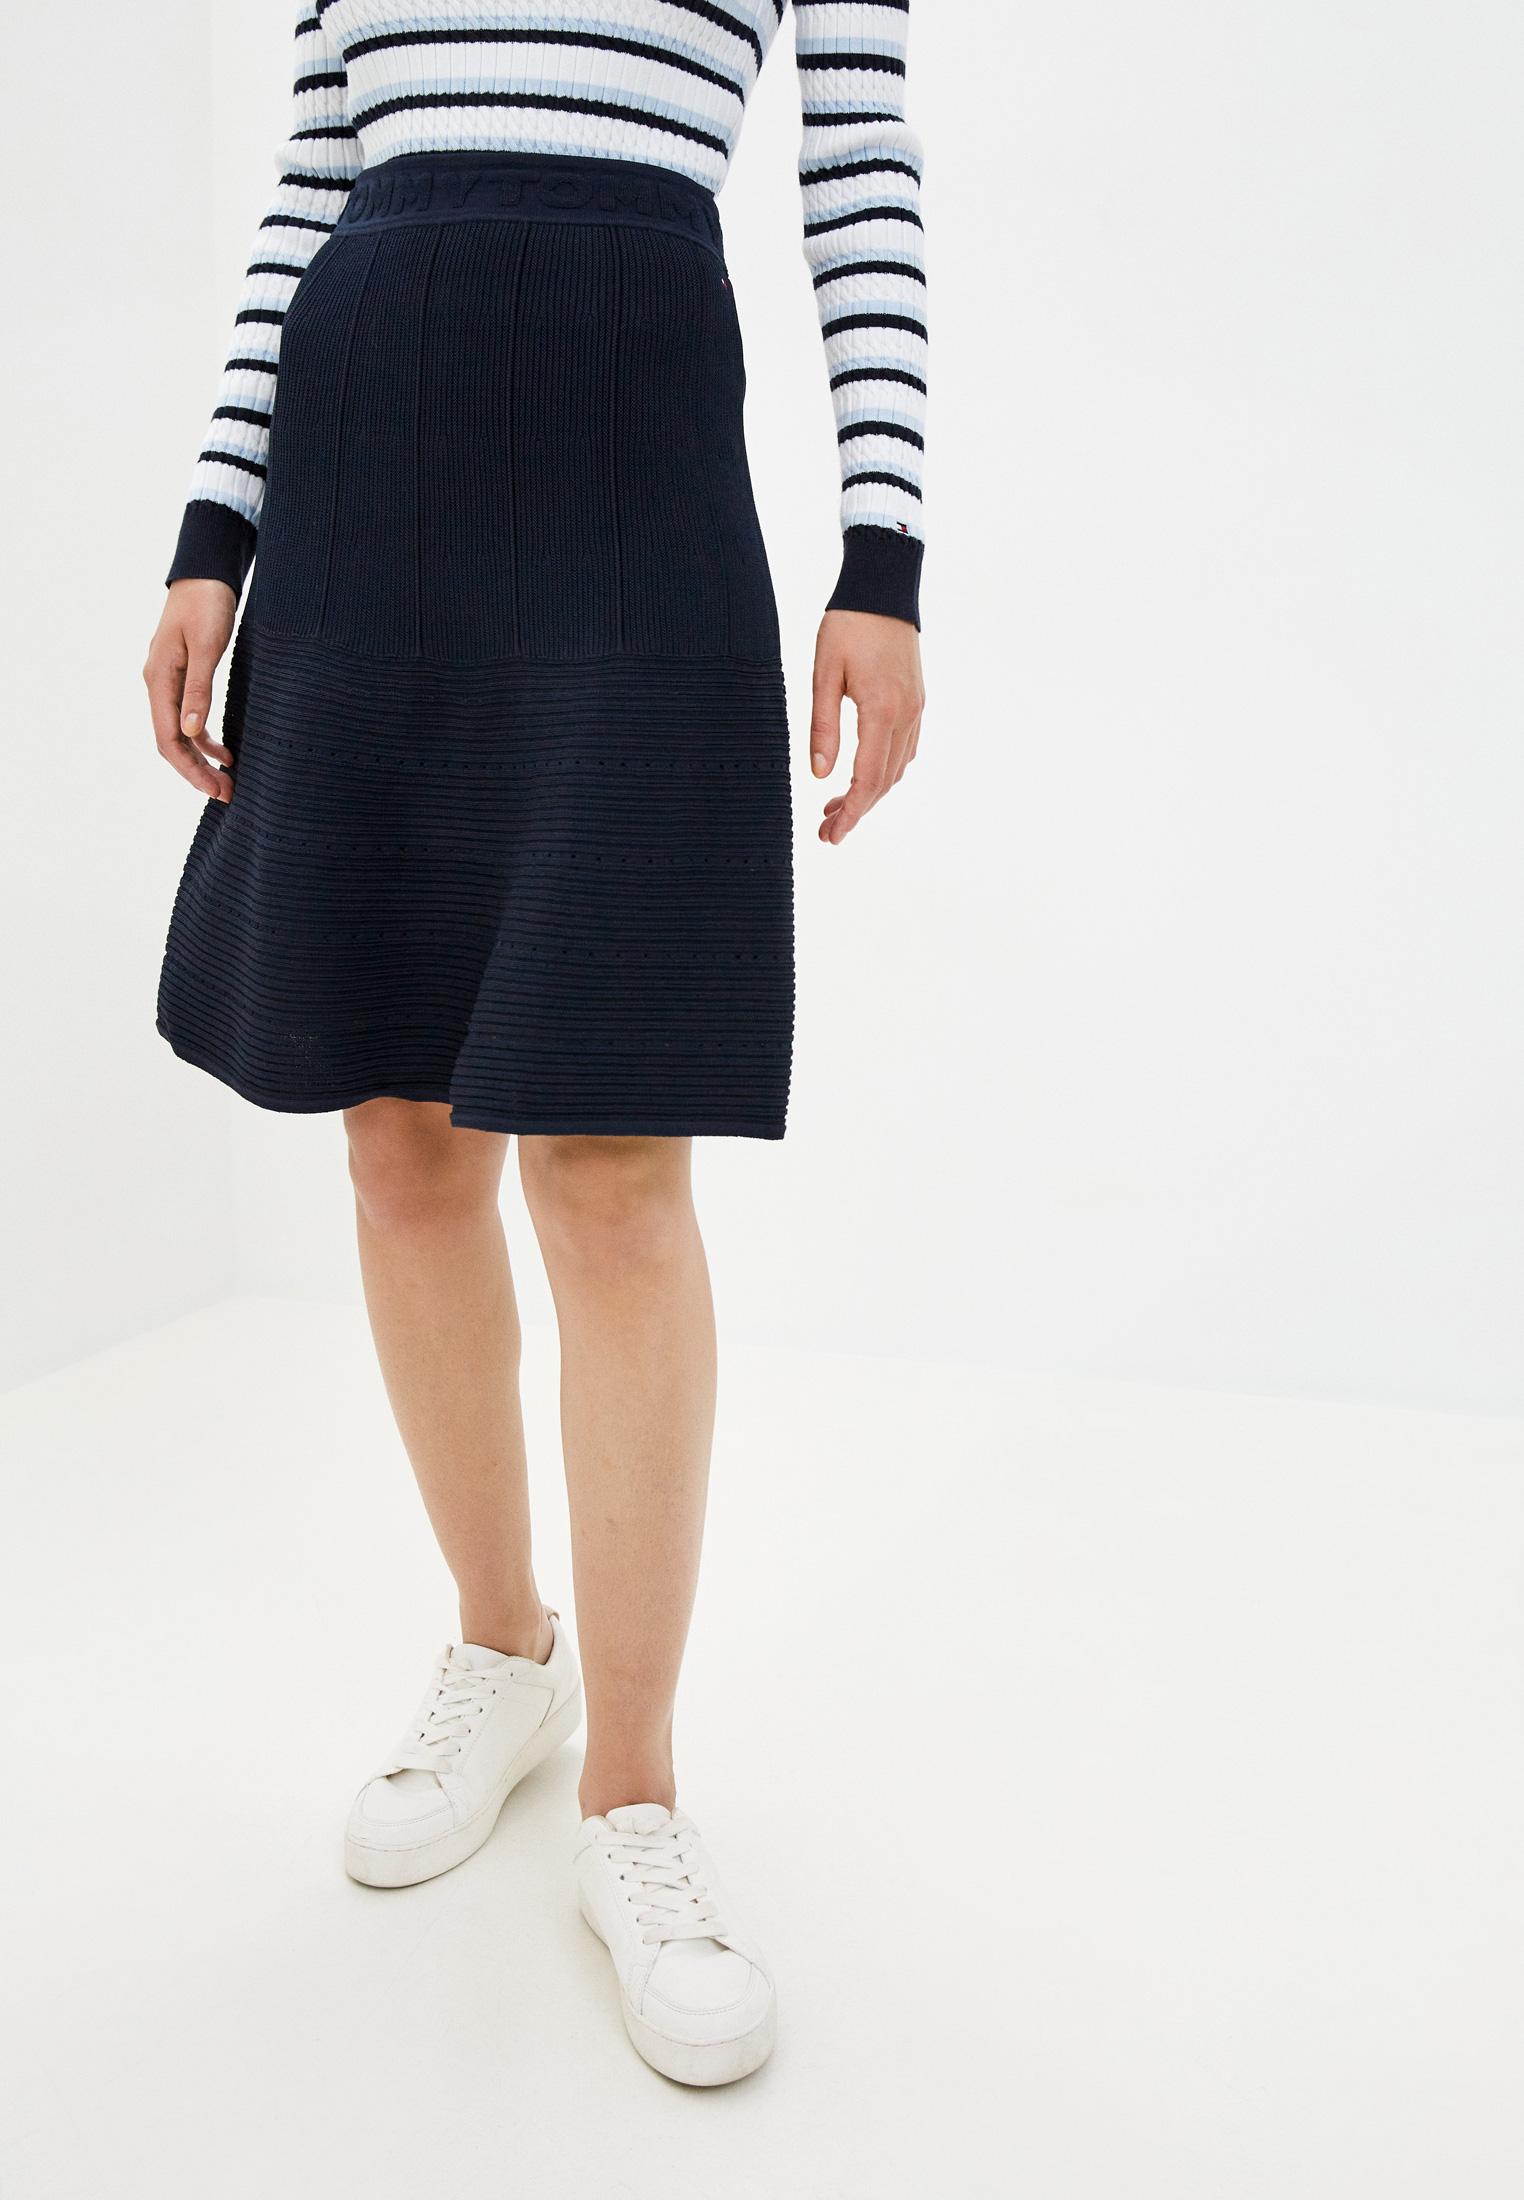 Широкая юбка Tommy Hilfiger (Томми Хилфигер) WW0WW28200